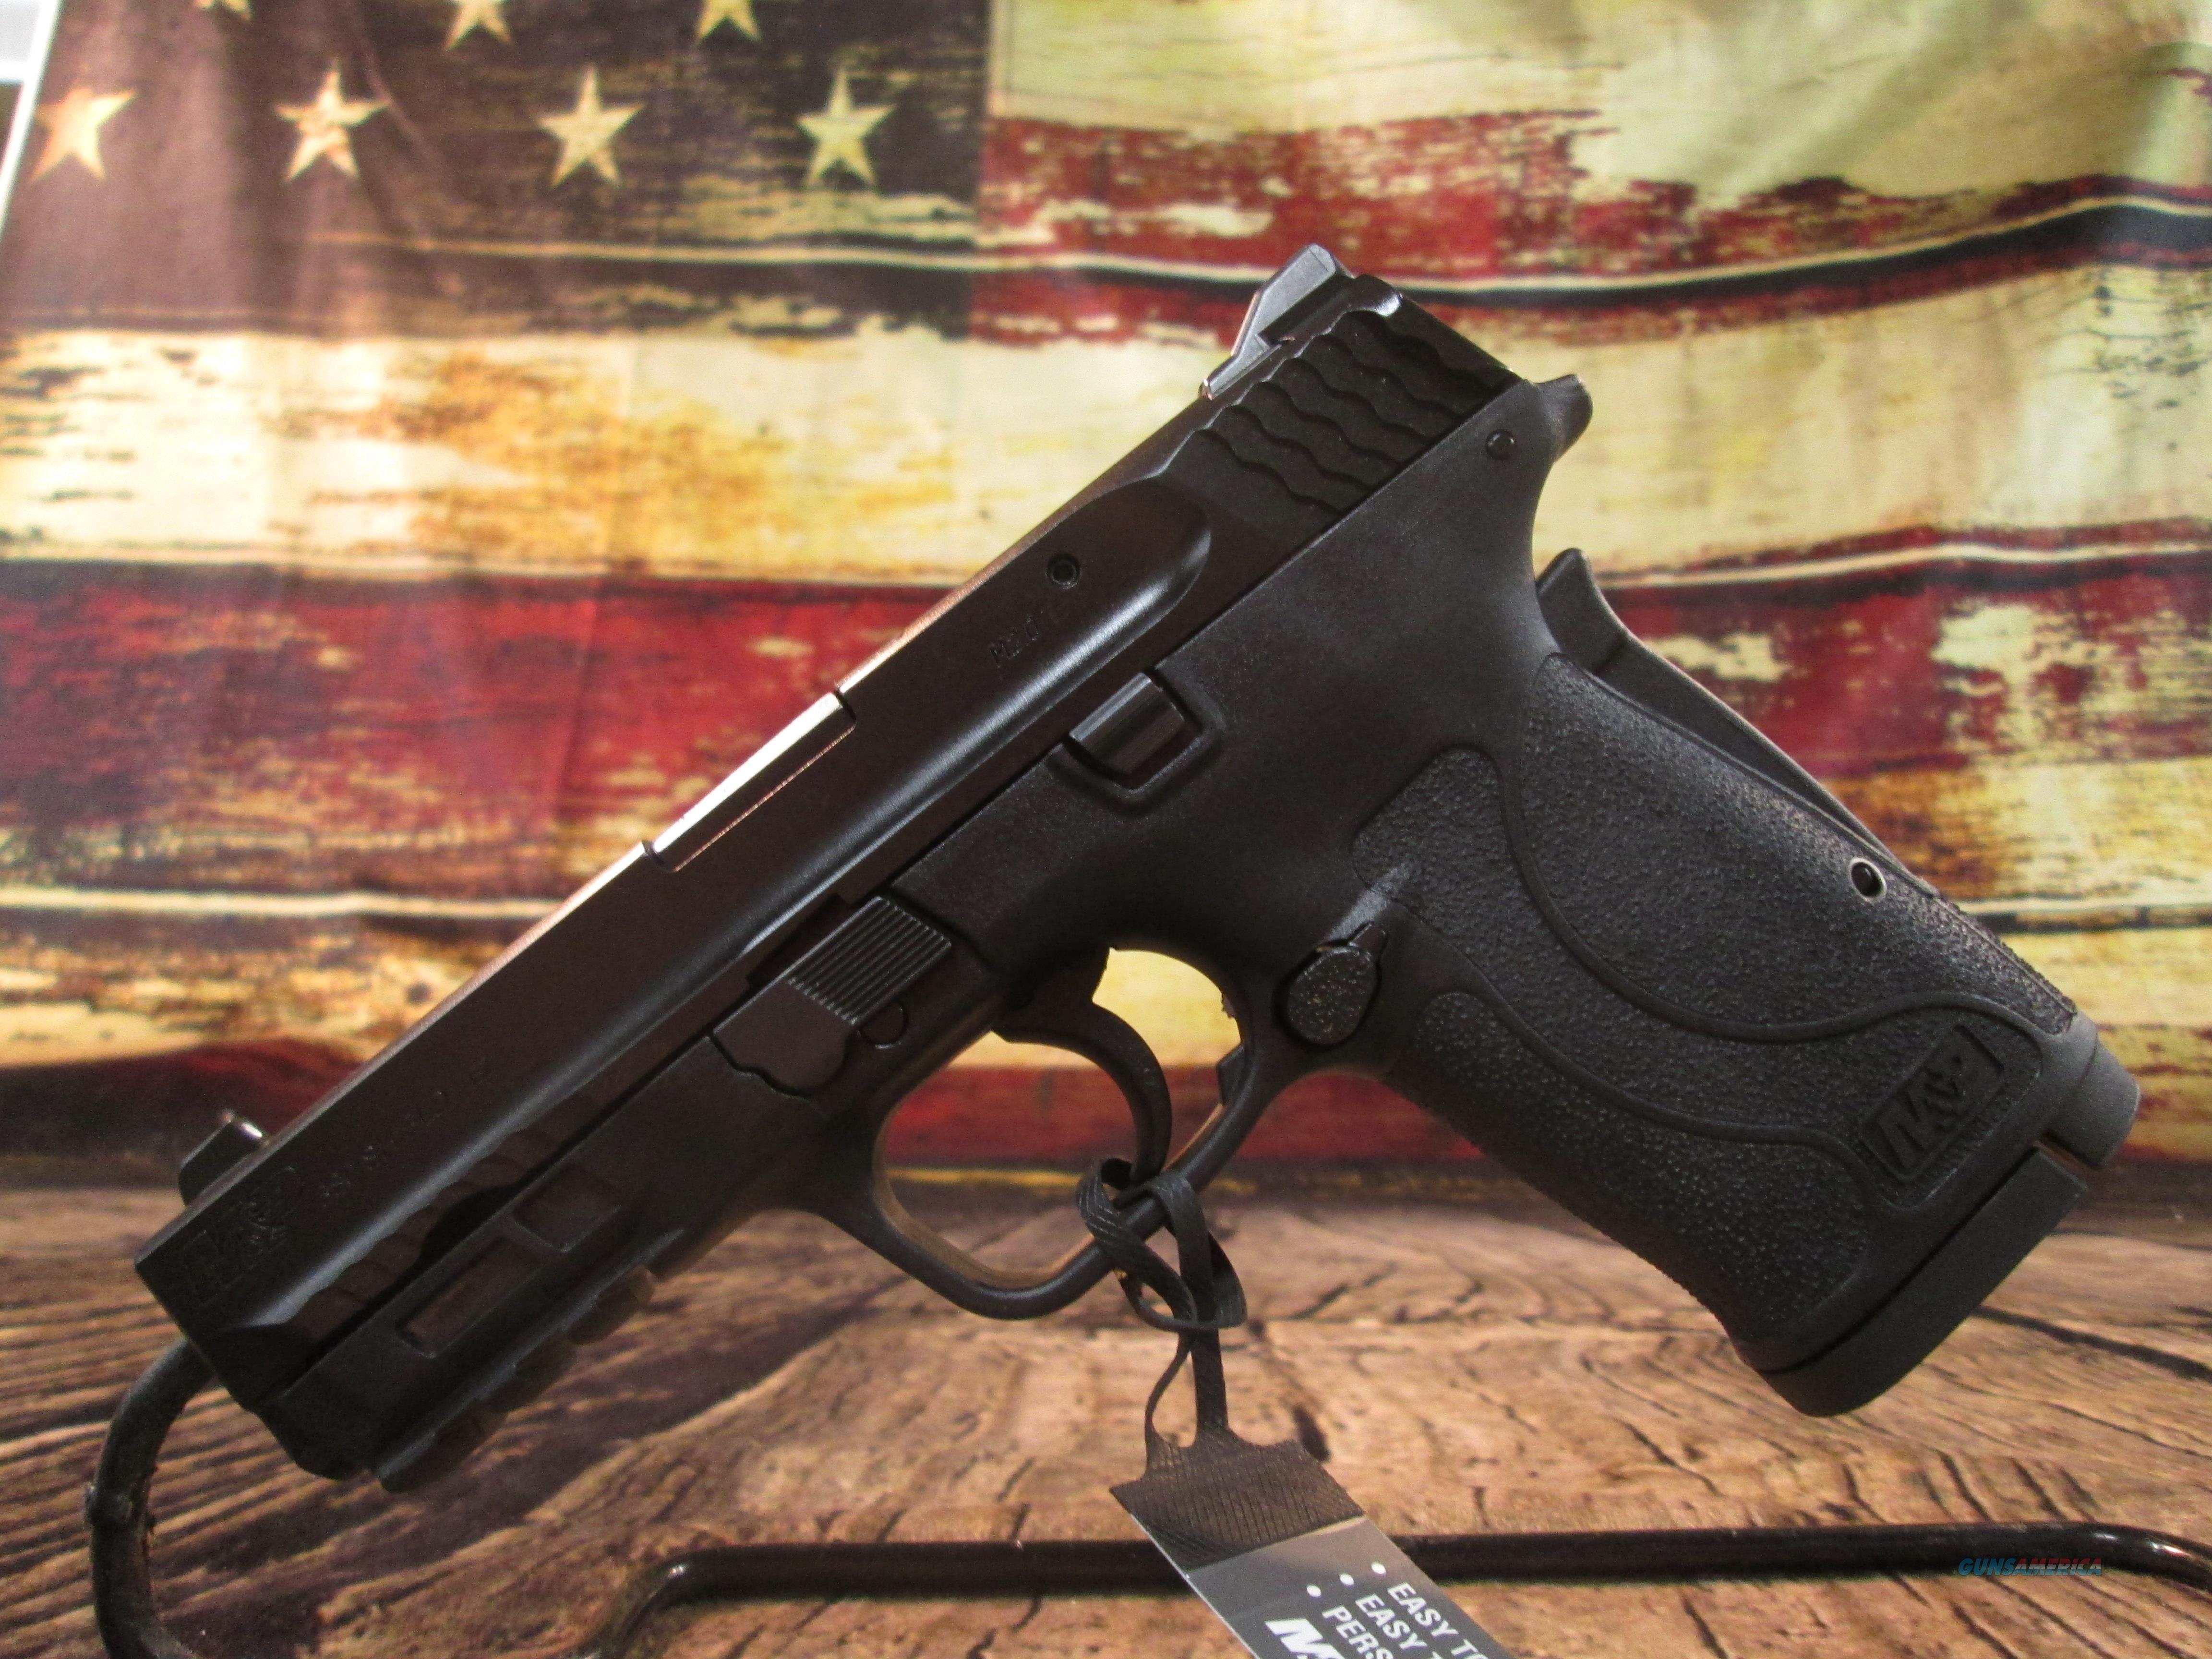 S&W M&P 380 SHIELD EZ NEW - NO THUMB SAFETY (180023)  Guns > Pistols > Smith & Wesson Pistols - Autos > Polymer Frame